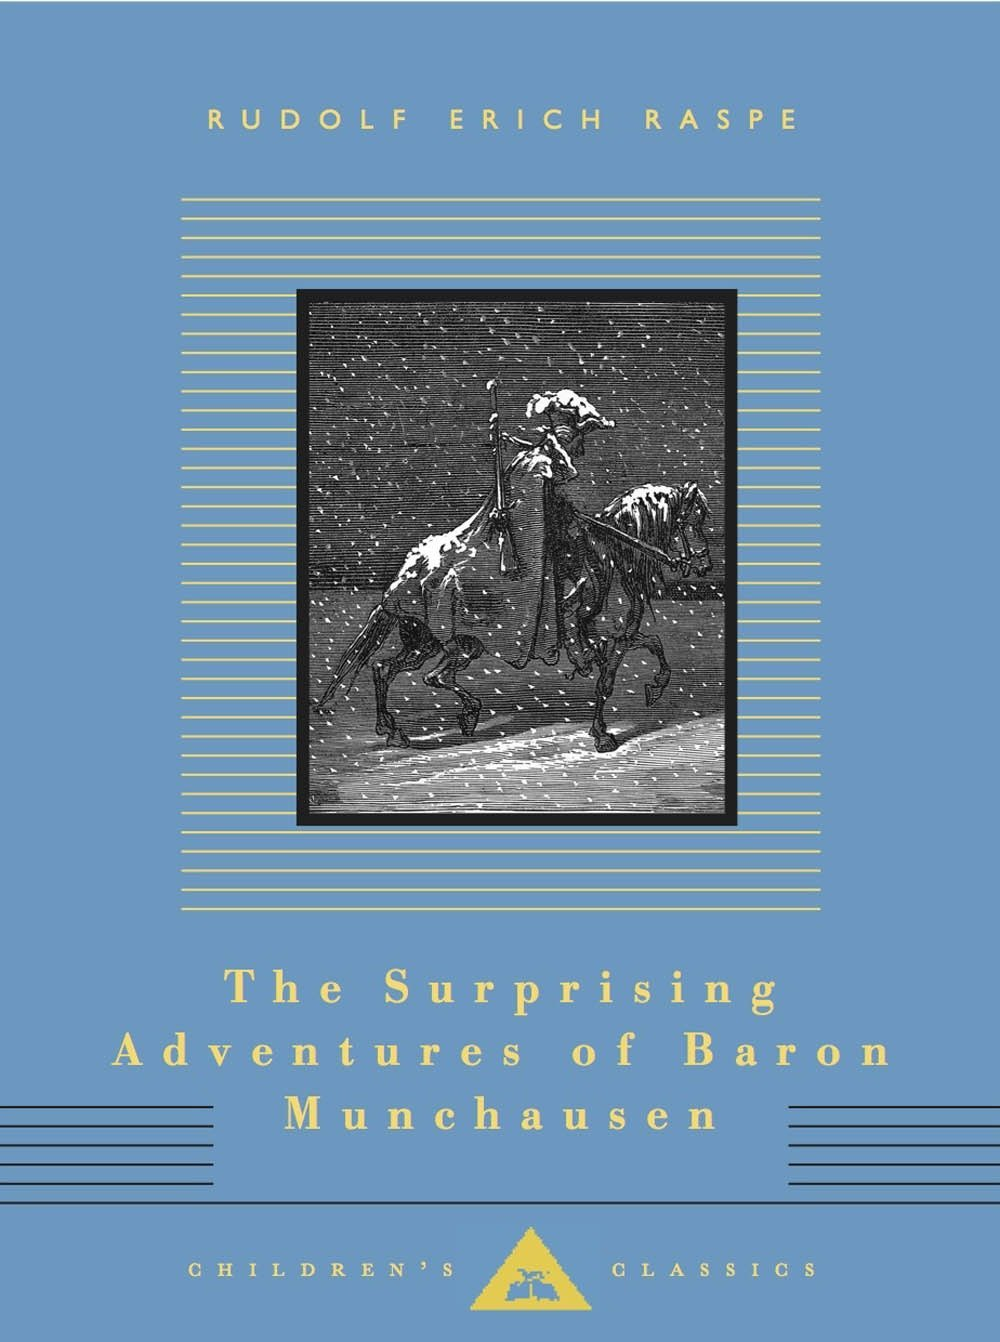 The Surprising Adventures of Baron Munchausen (Everyman's Library Children's Classics Series) ebook